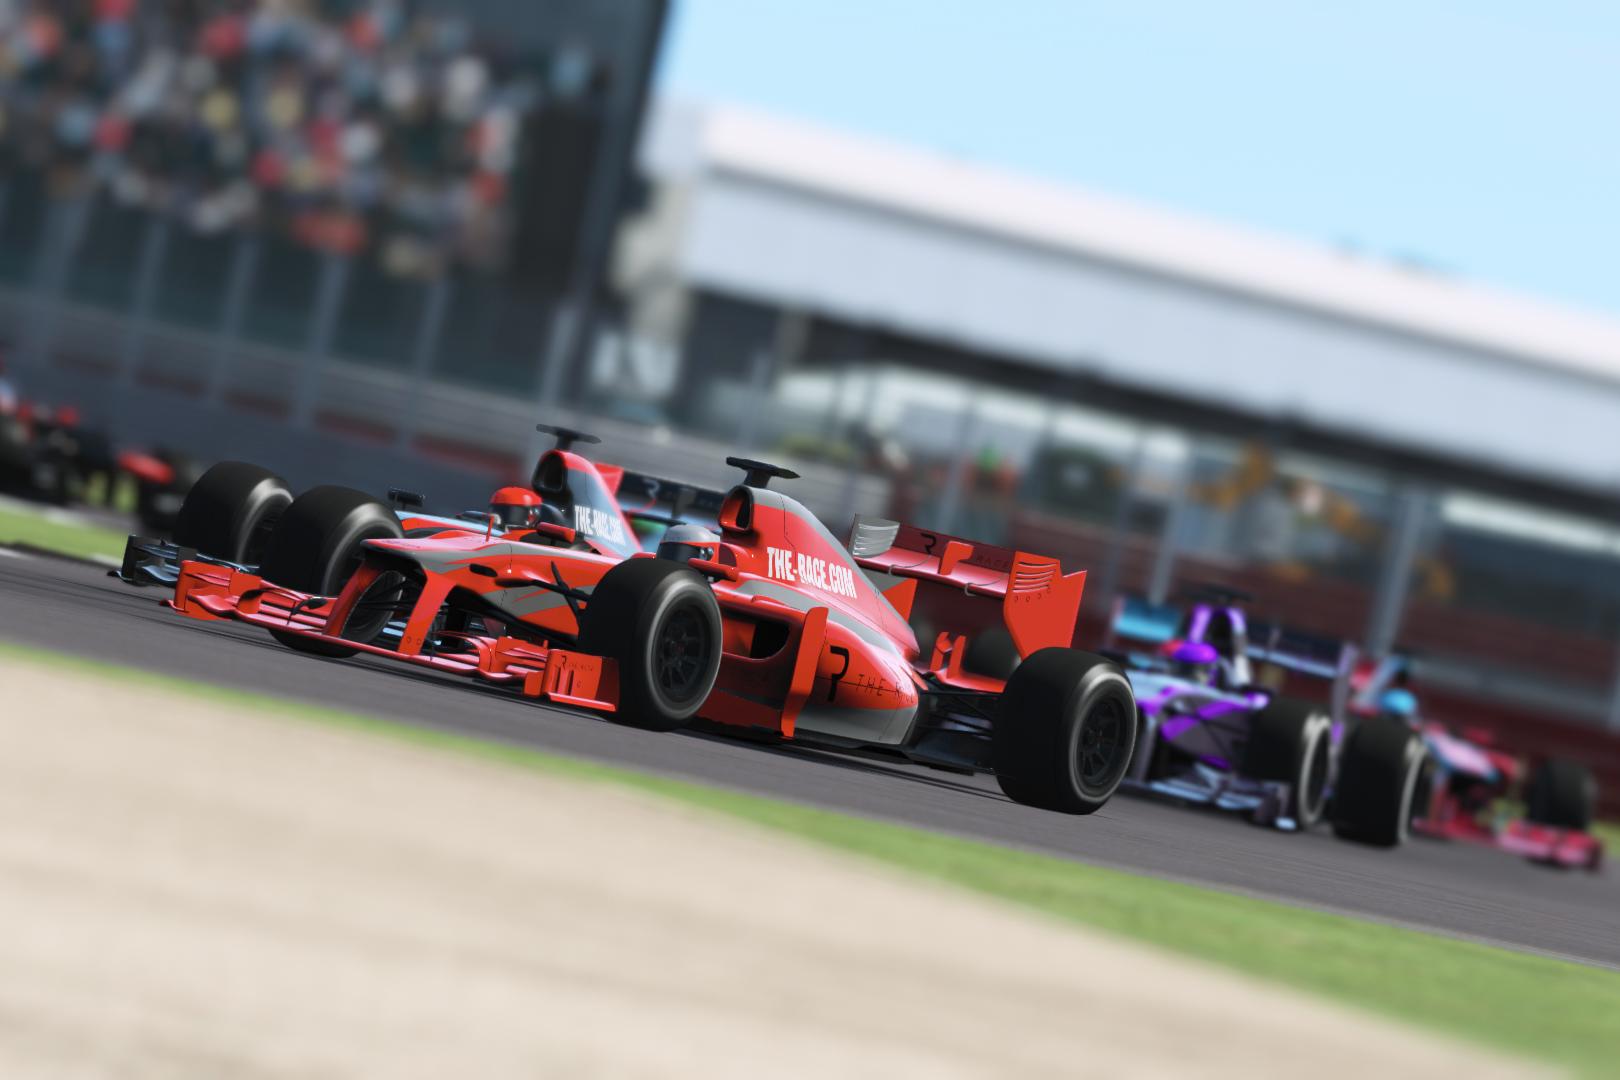 The Race's All-Star Esports Battle